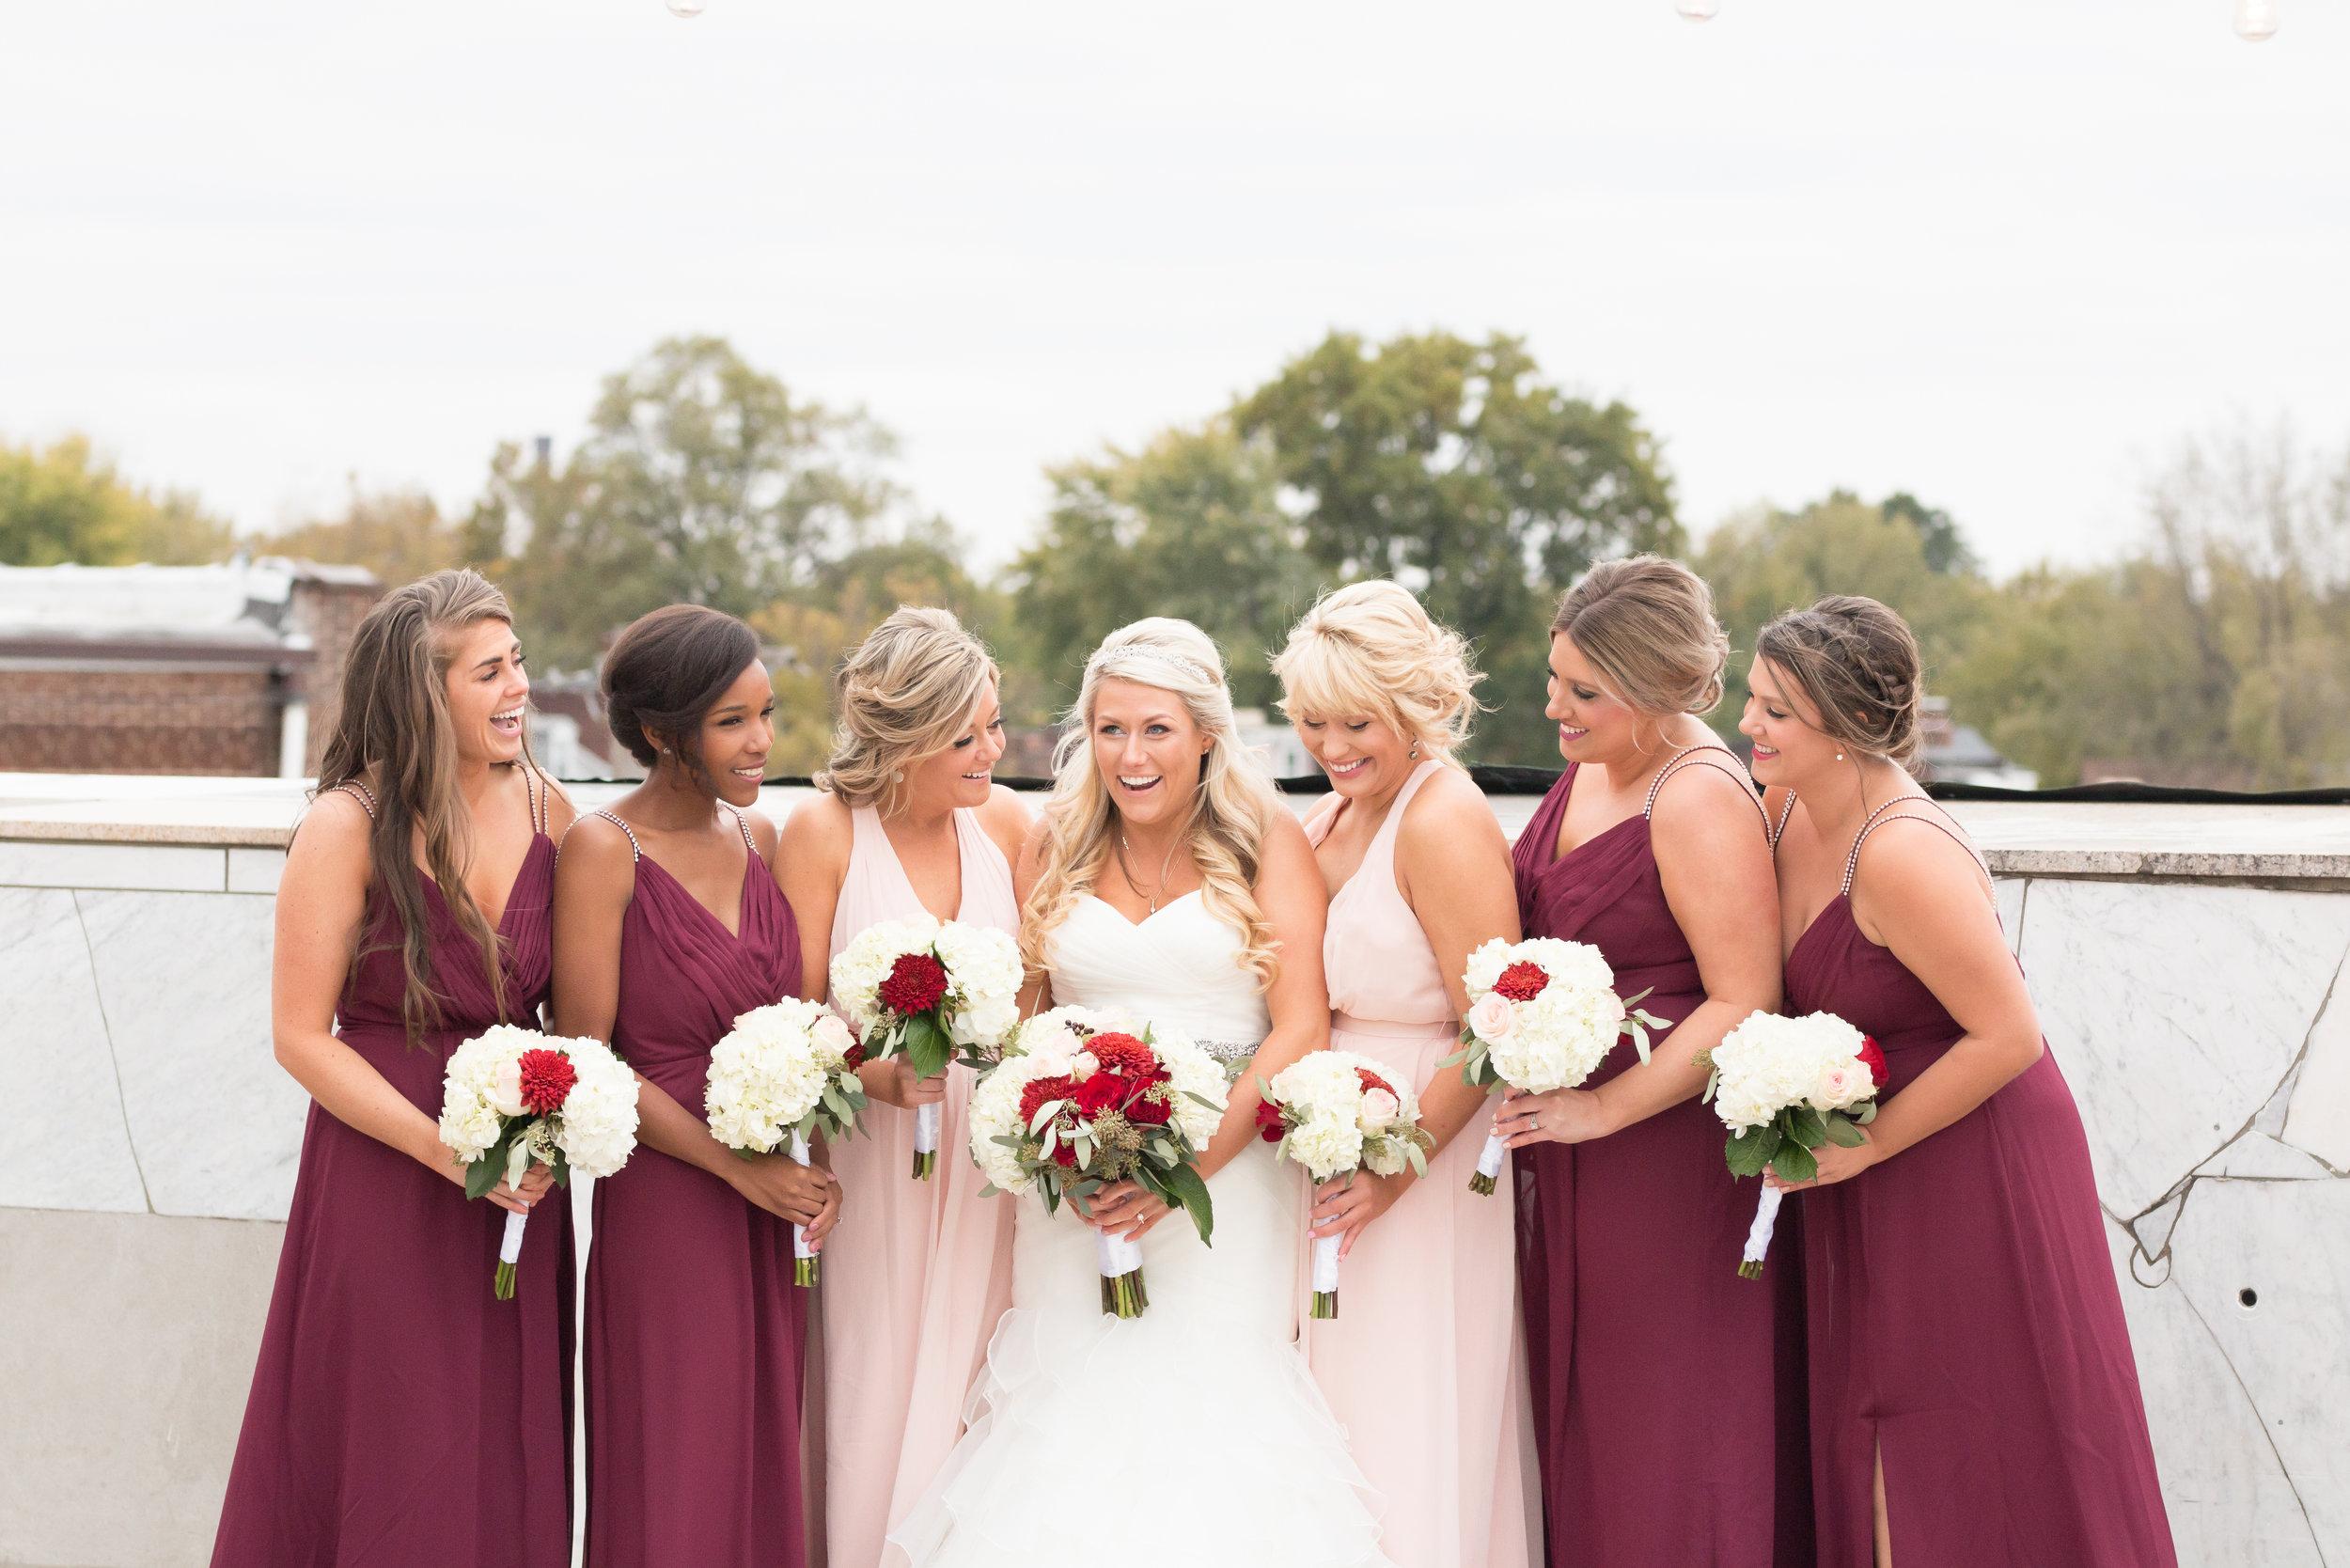 Jessica & Kurtis Wedding_14 - 20171028.jpg